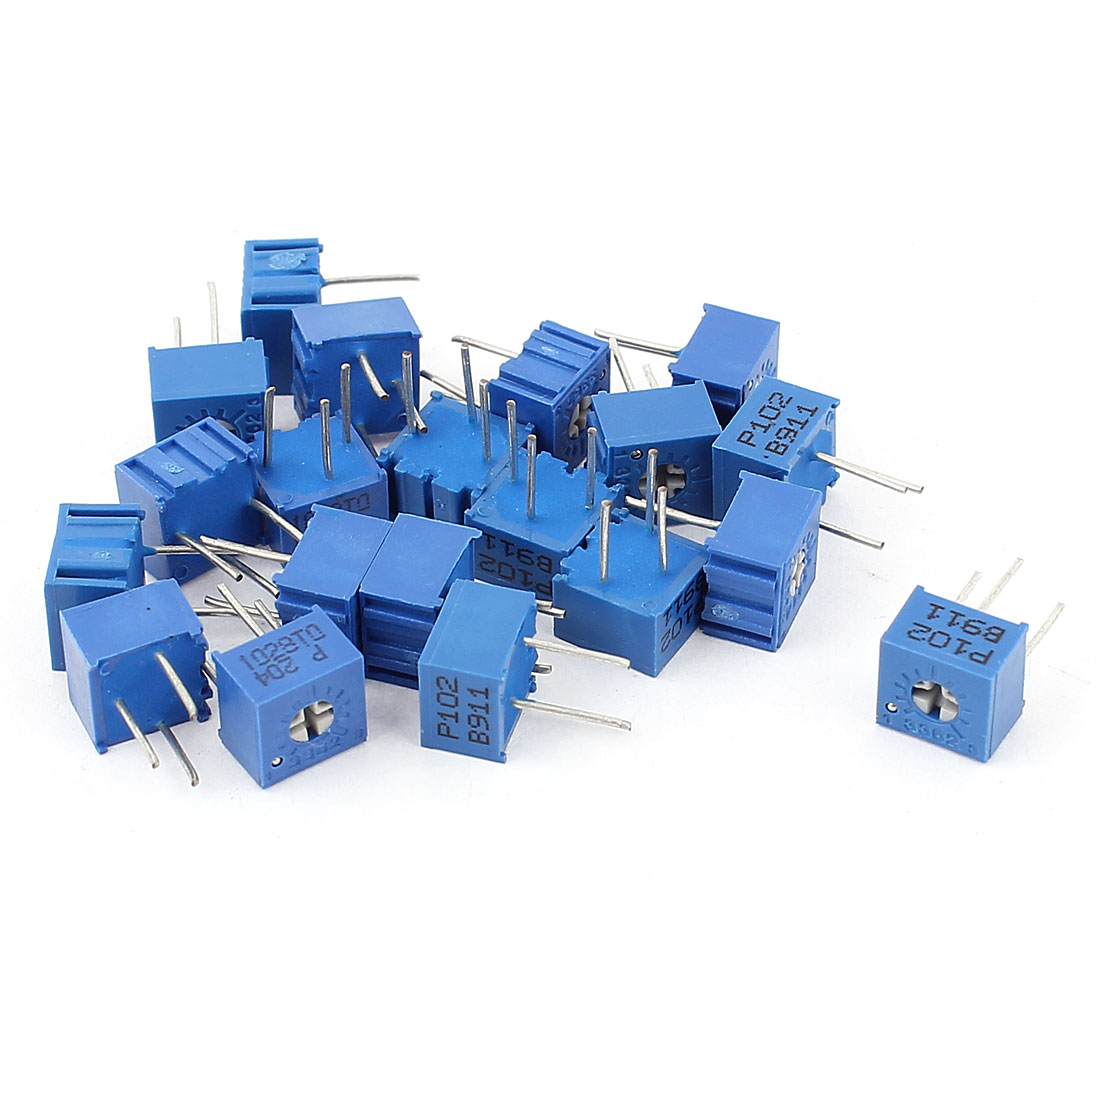 20Pcs Potentiometer Trimmer Variable Resistor 3362P-102 3362P-204